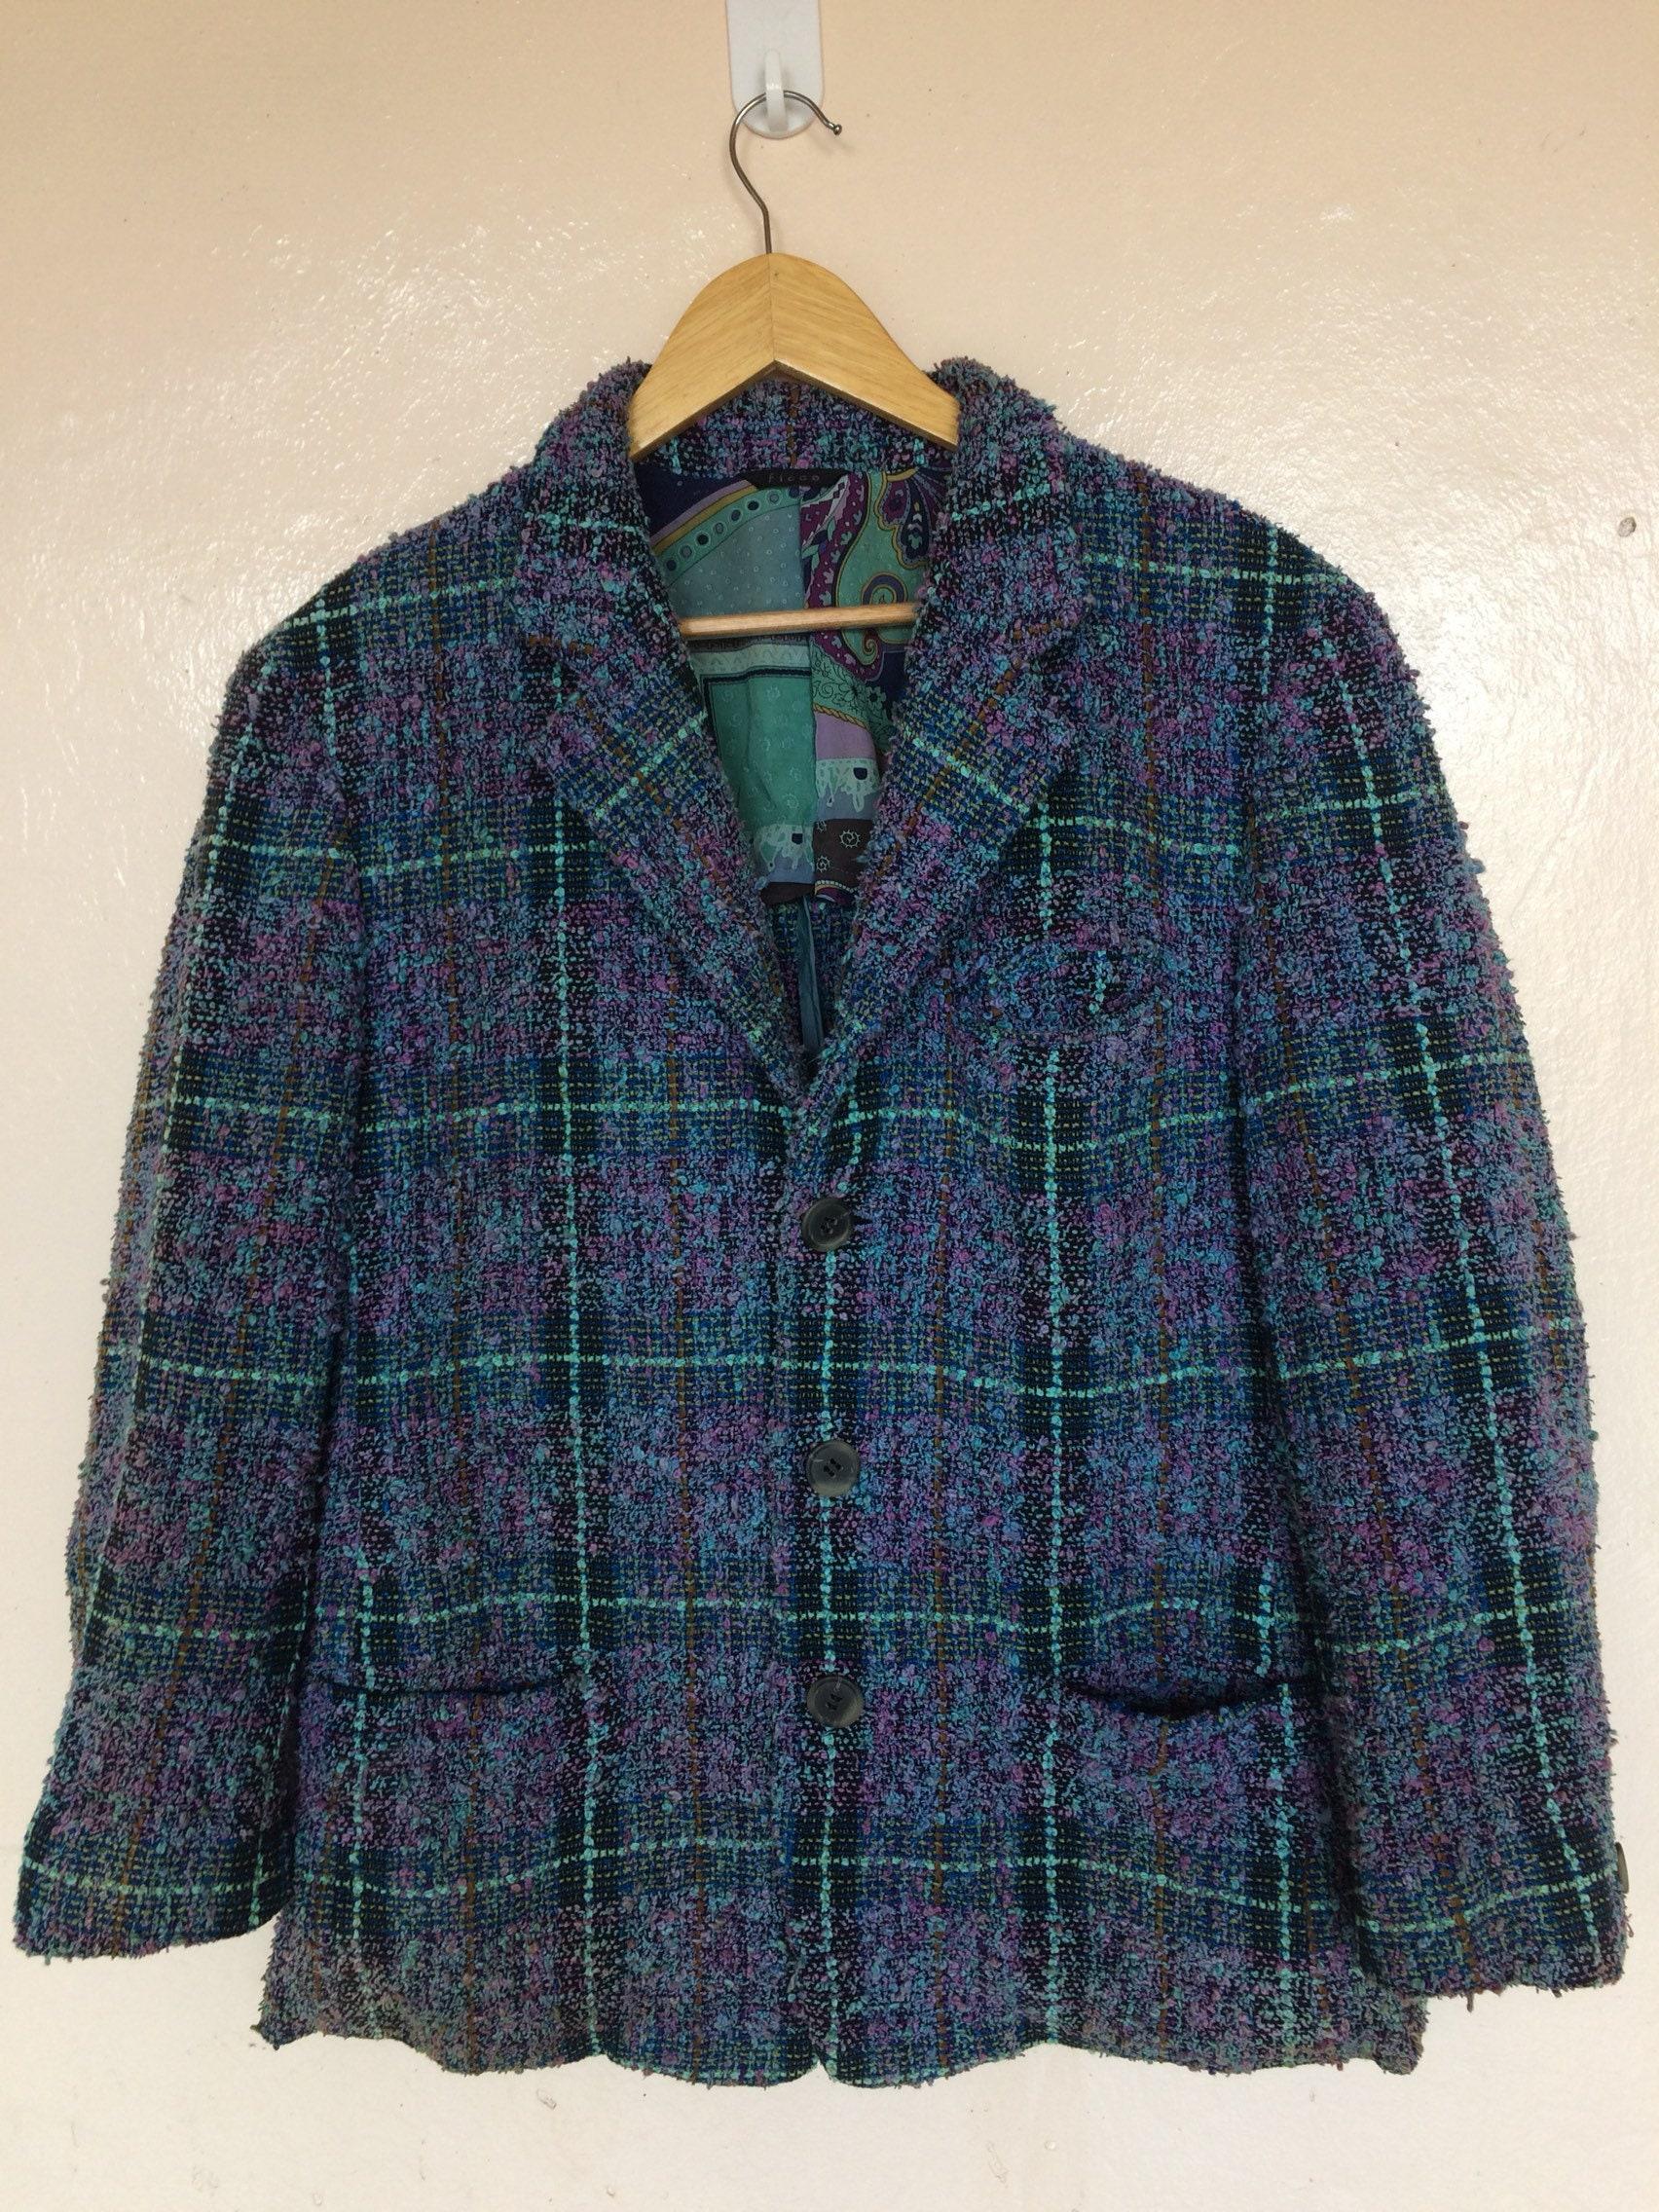 Yoshiyuki Konishi manteau japonais Design Designer joli Design japonais  vintage en provenance du Japon 51b610 43894b7ba62